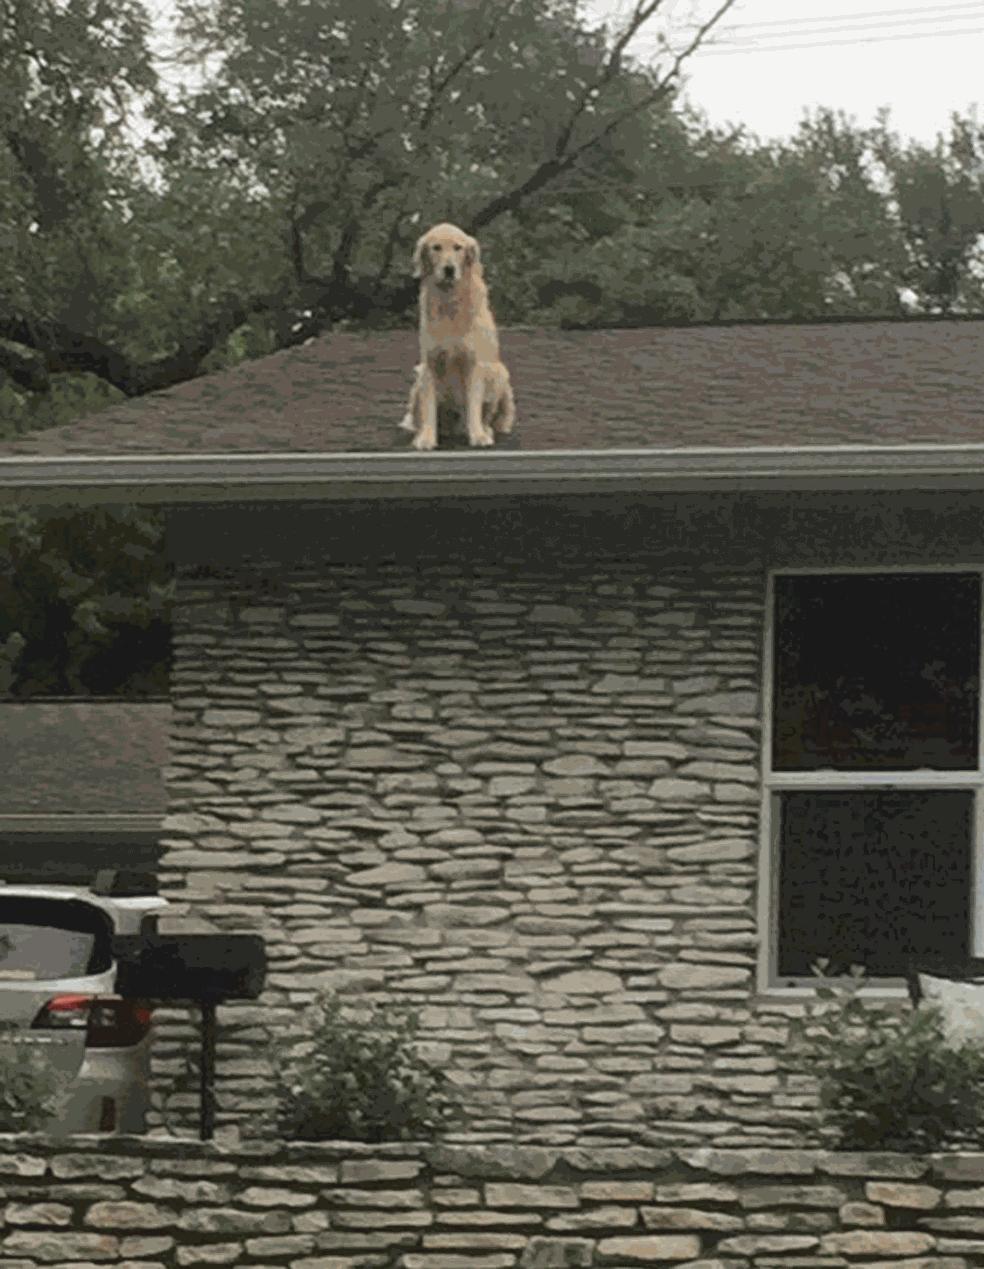 Huckeberry no telhado (Foto: Twitter)